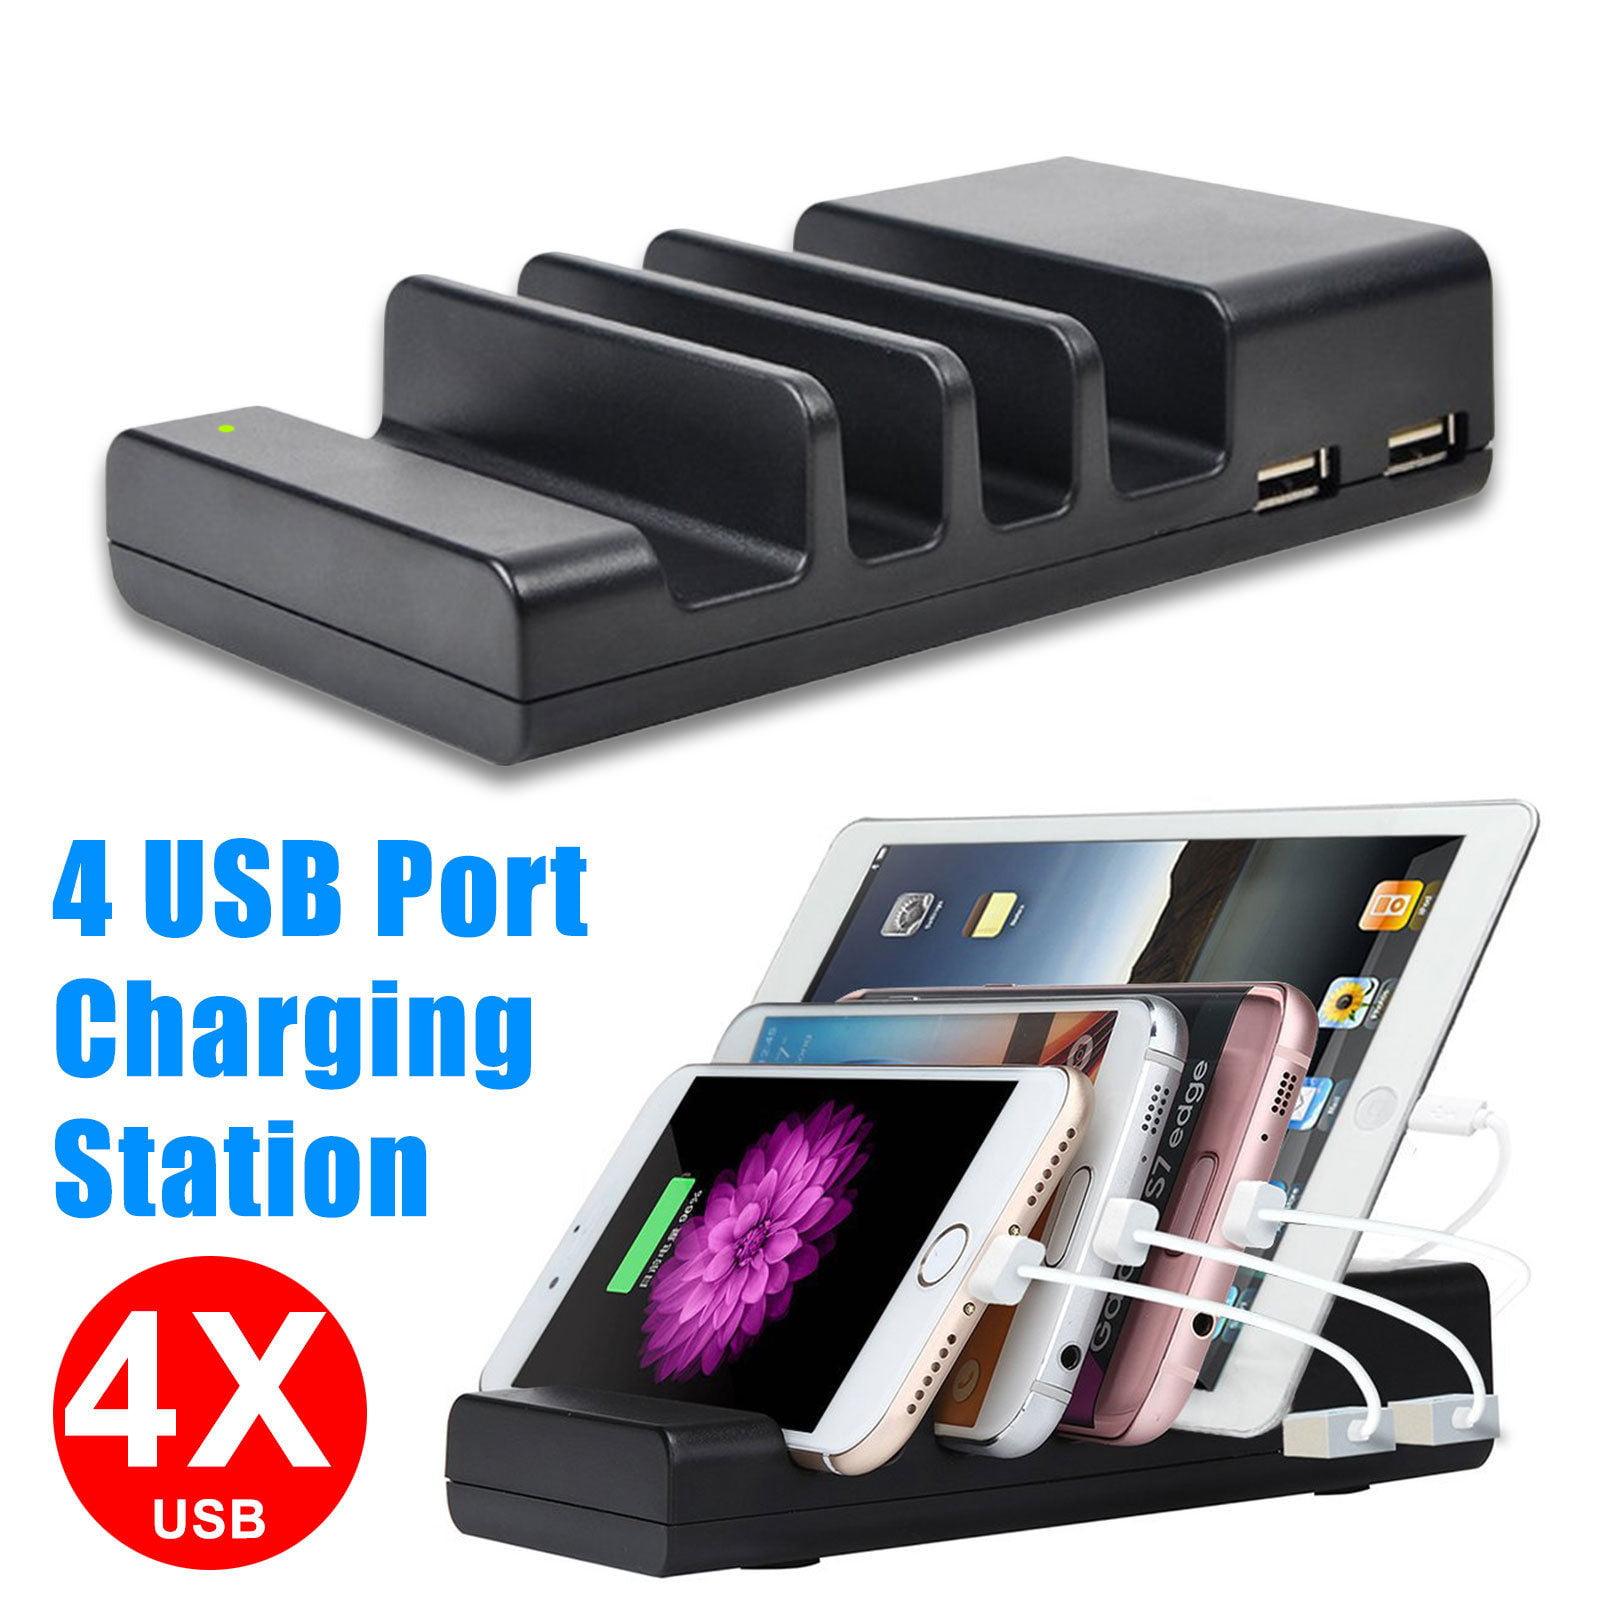 TSV 4-Port Multi USB Charging Station Stand Desktop Charger Dock For Cellphone Smartphone Tablet